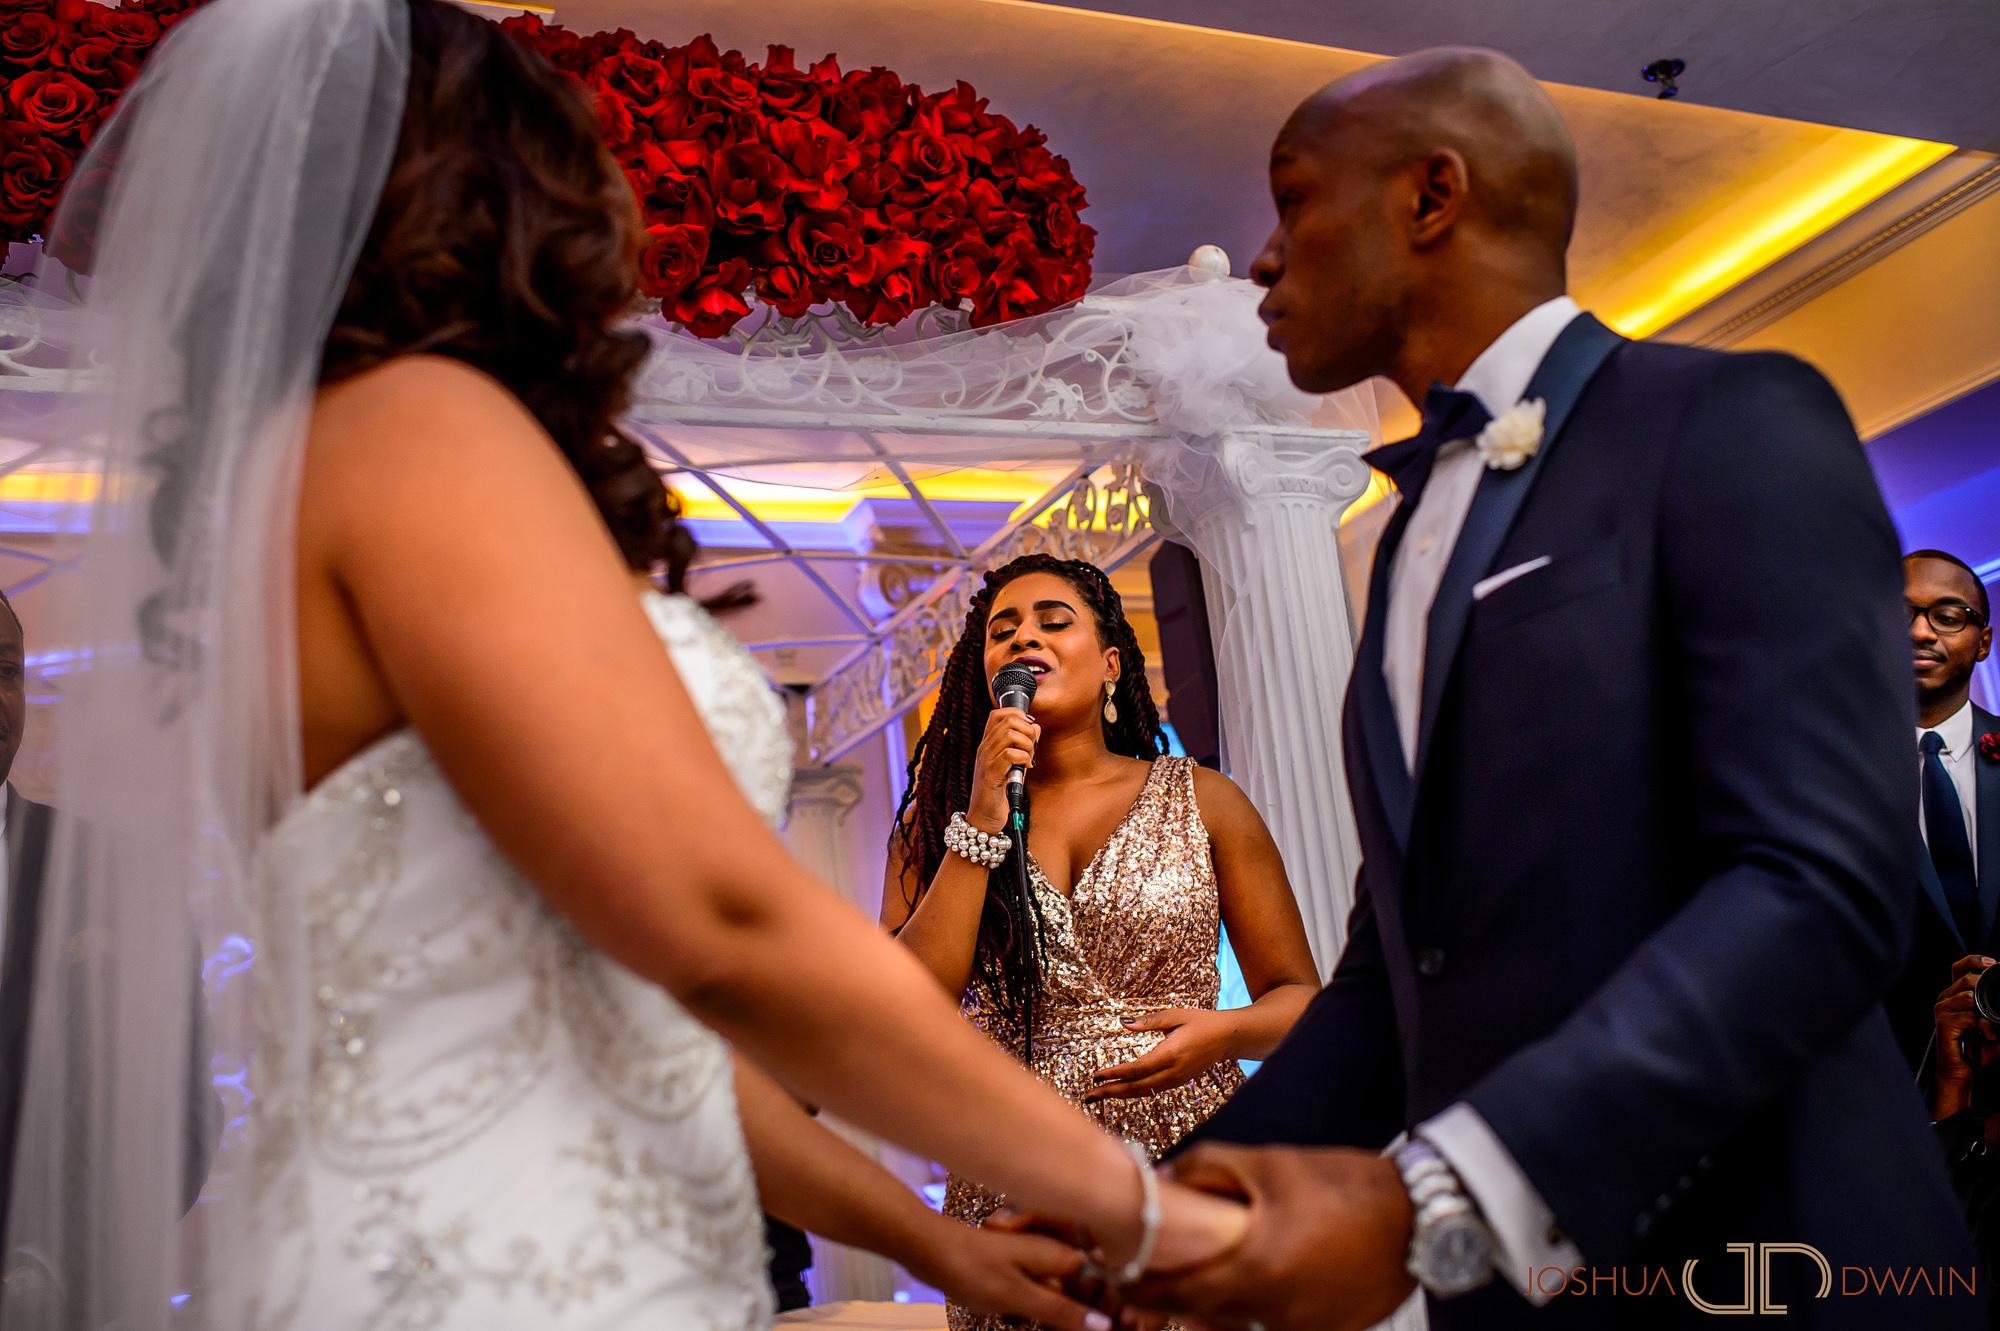 Lorraine & Ryan's Wedding at Jericho Terrace in Long Island, NY